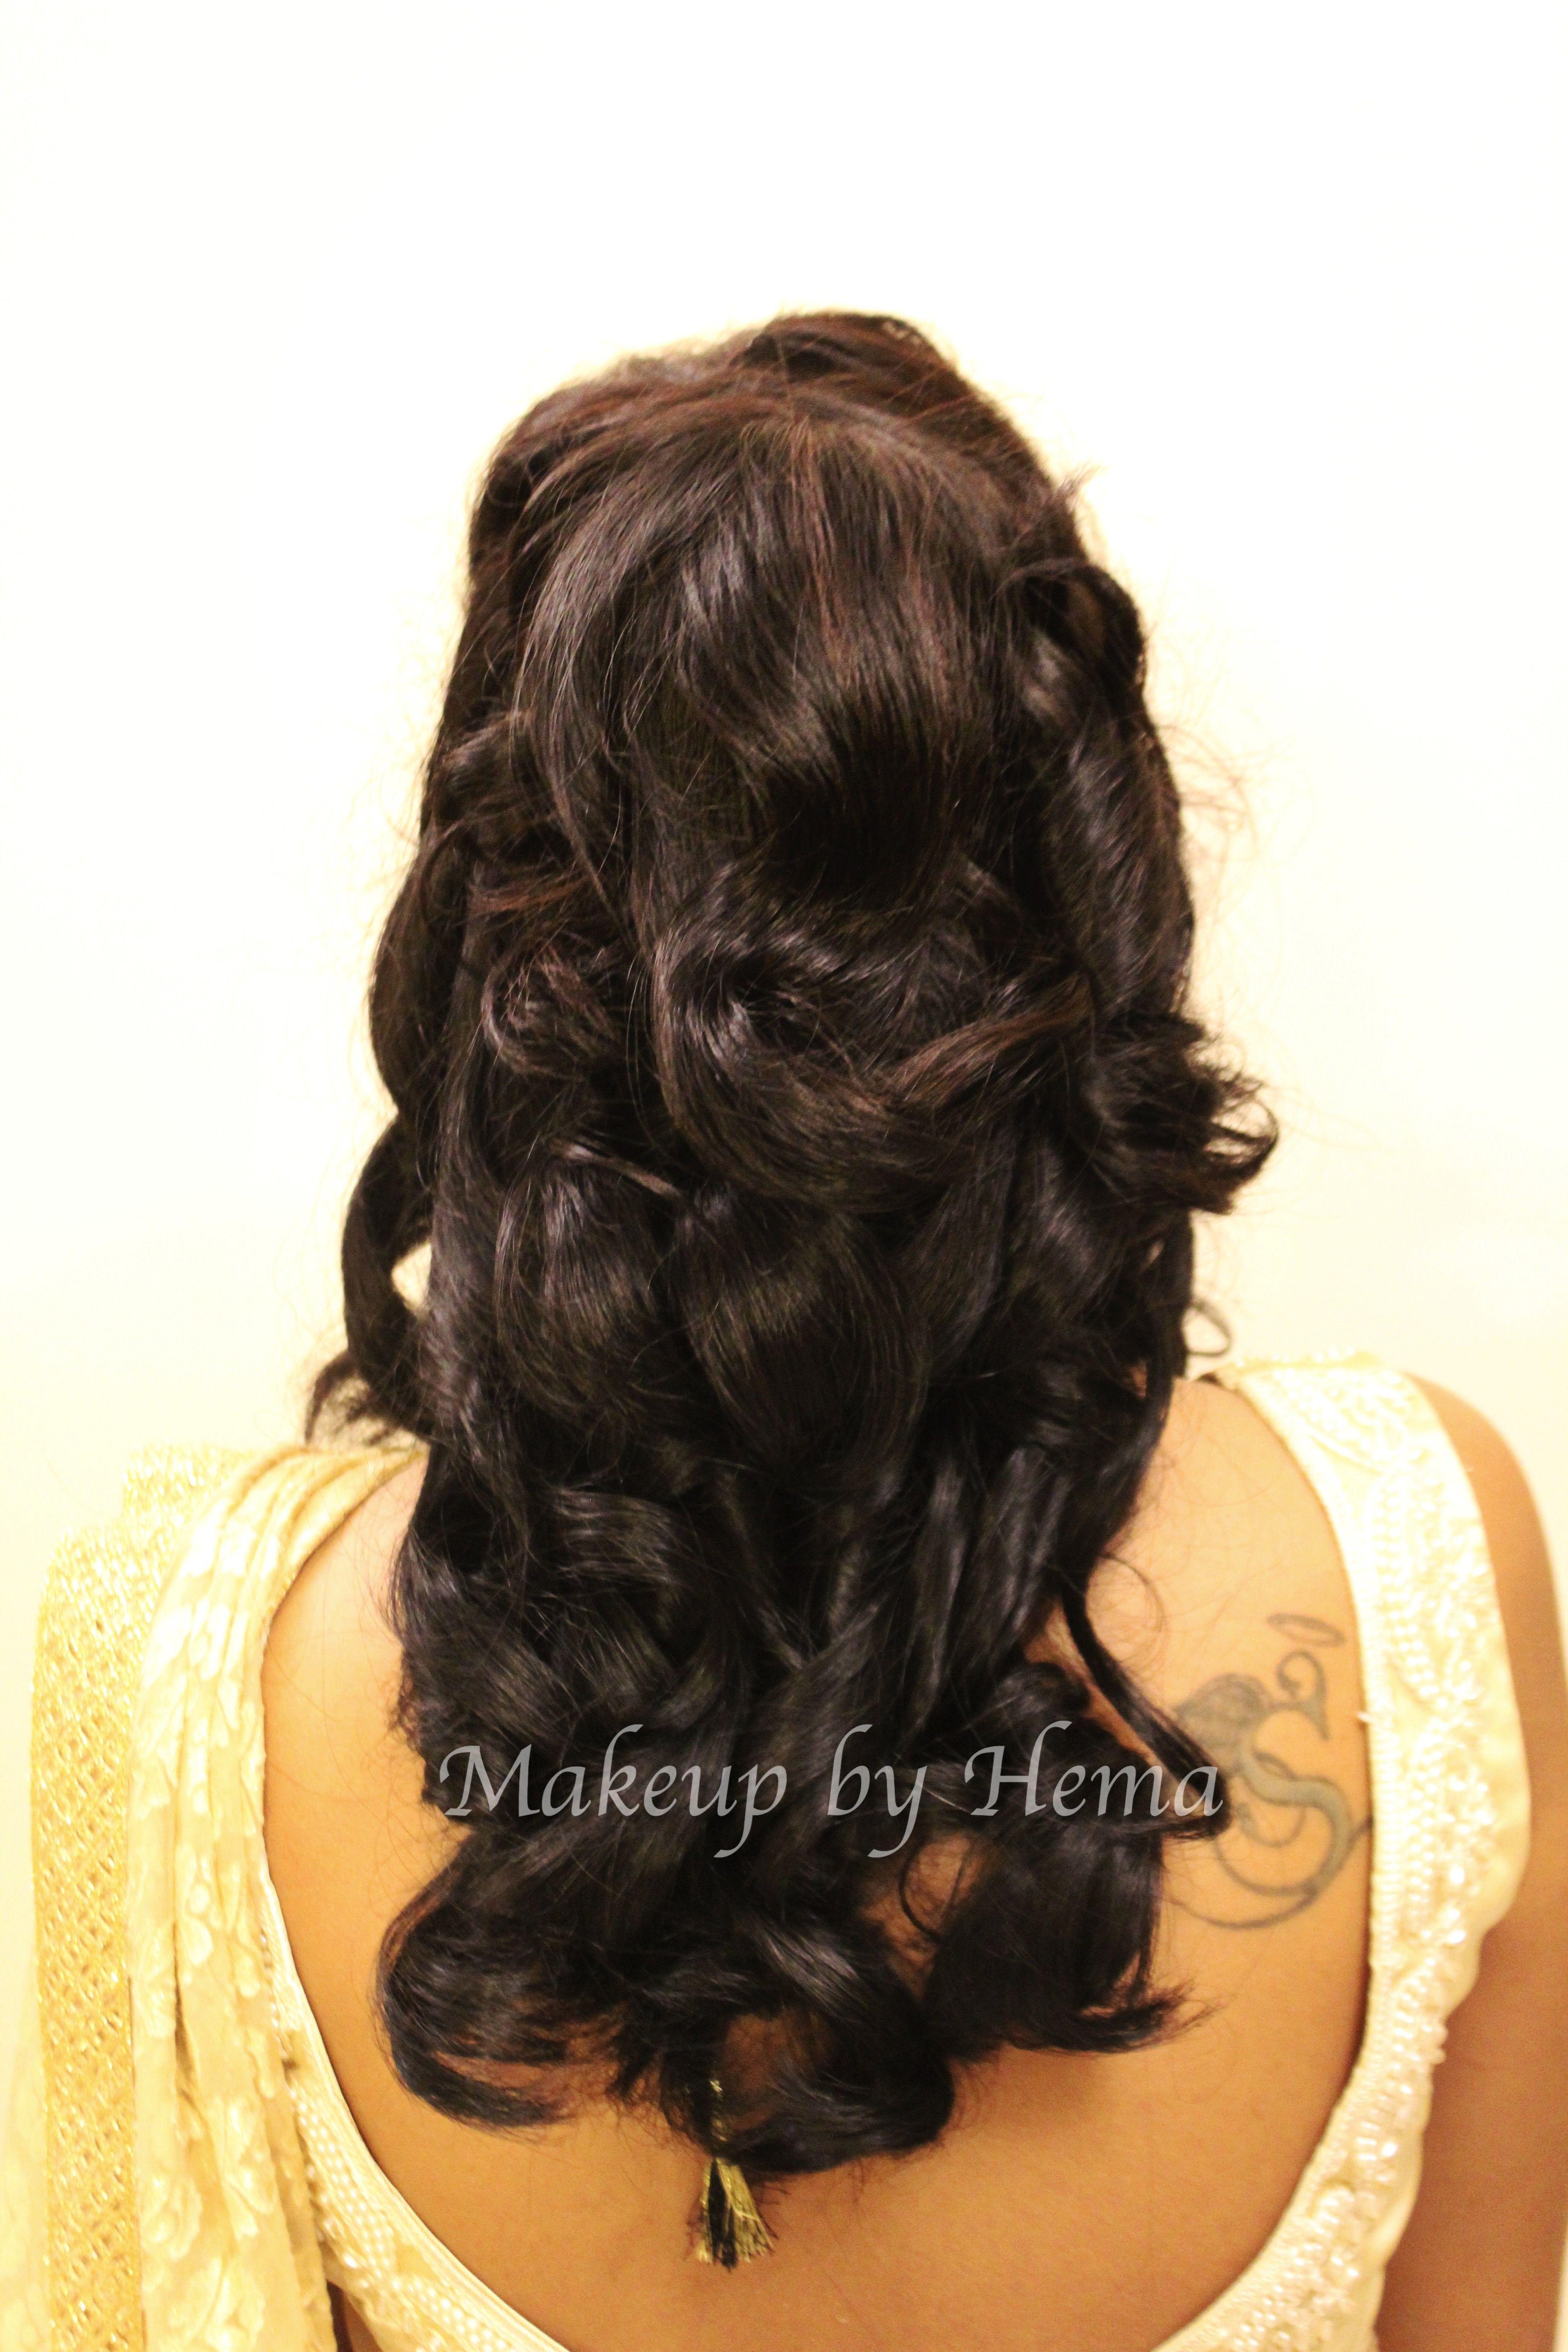 Party hairstyle pretty half up half down half updo loose curls